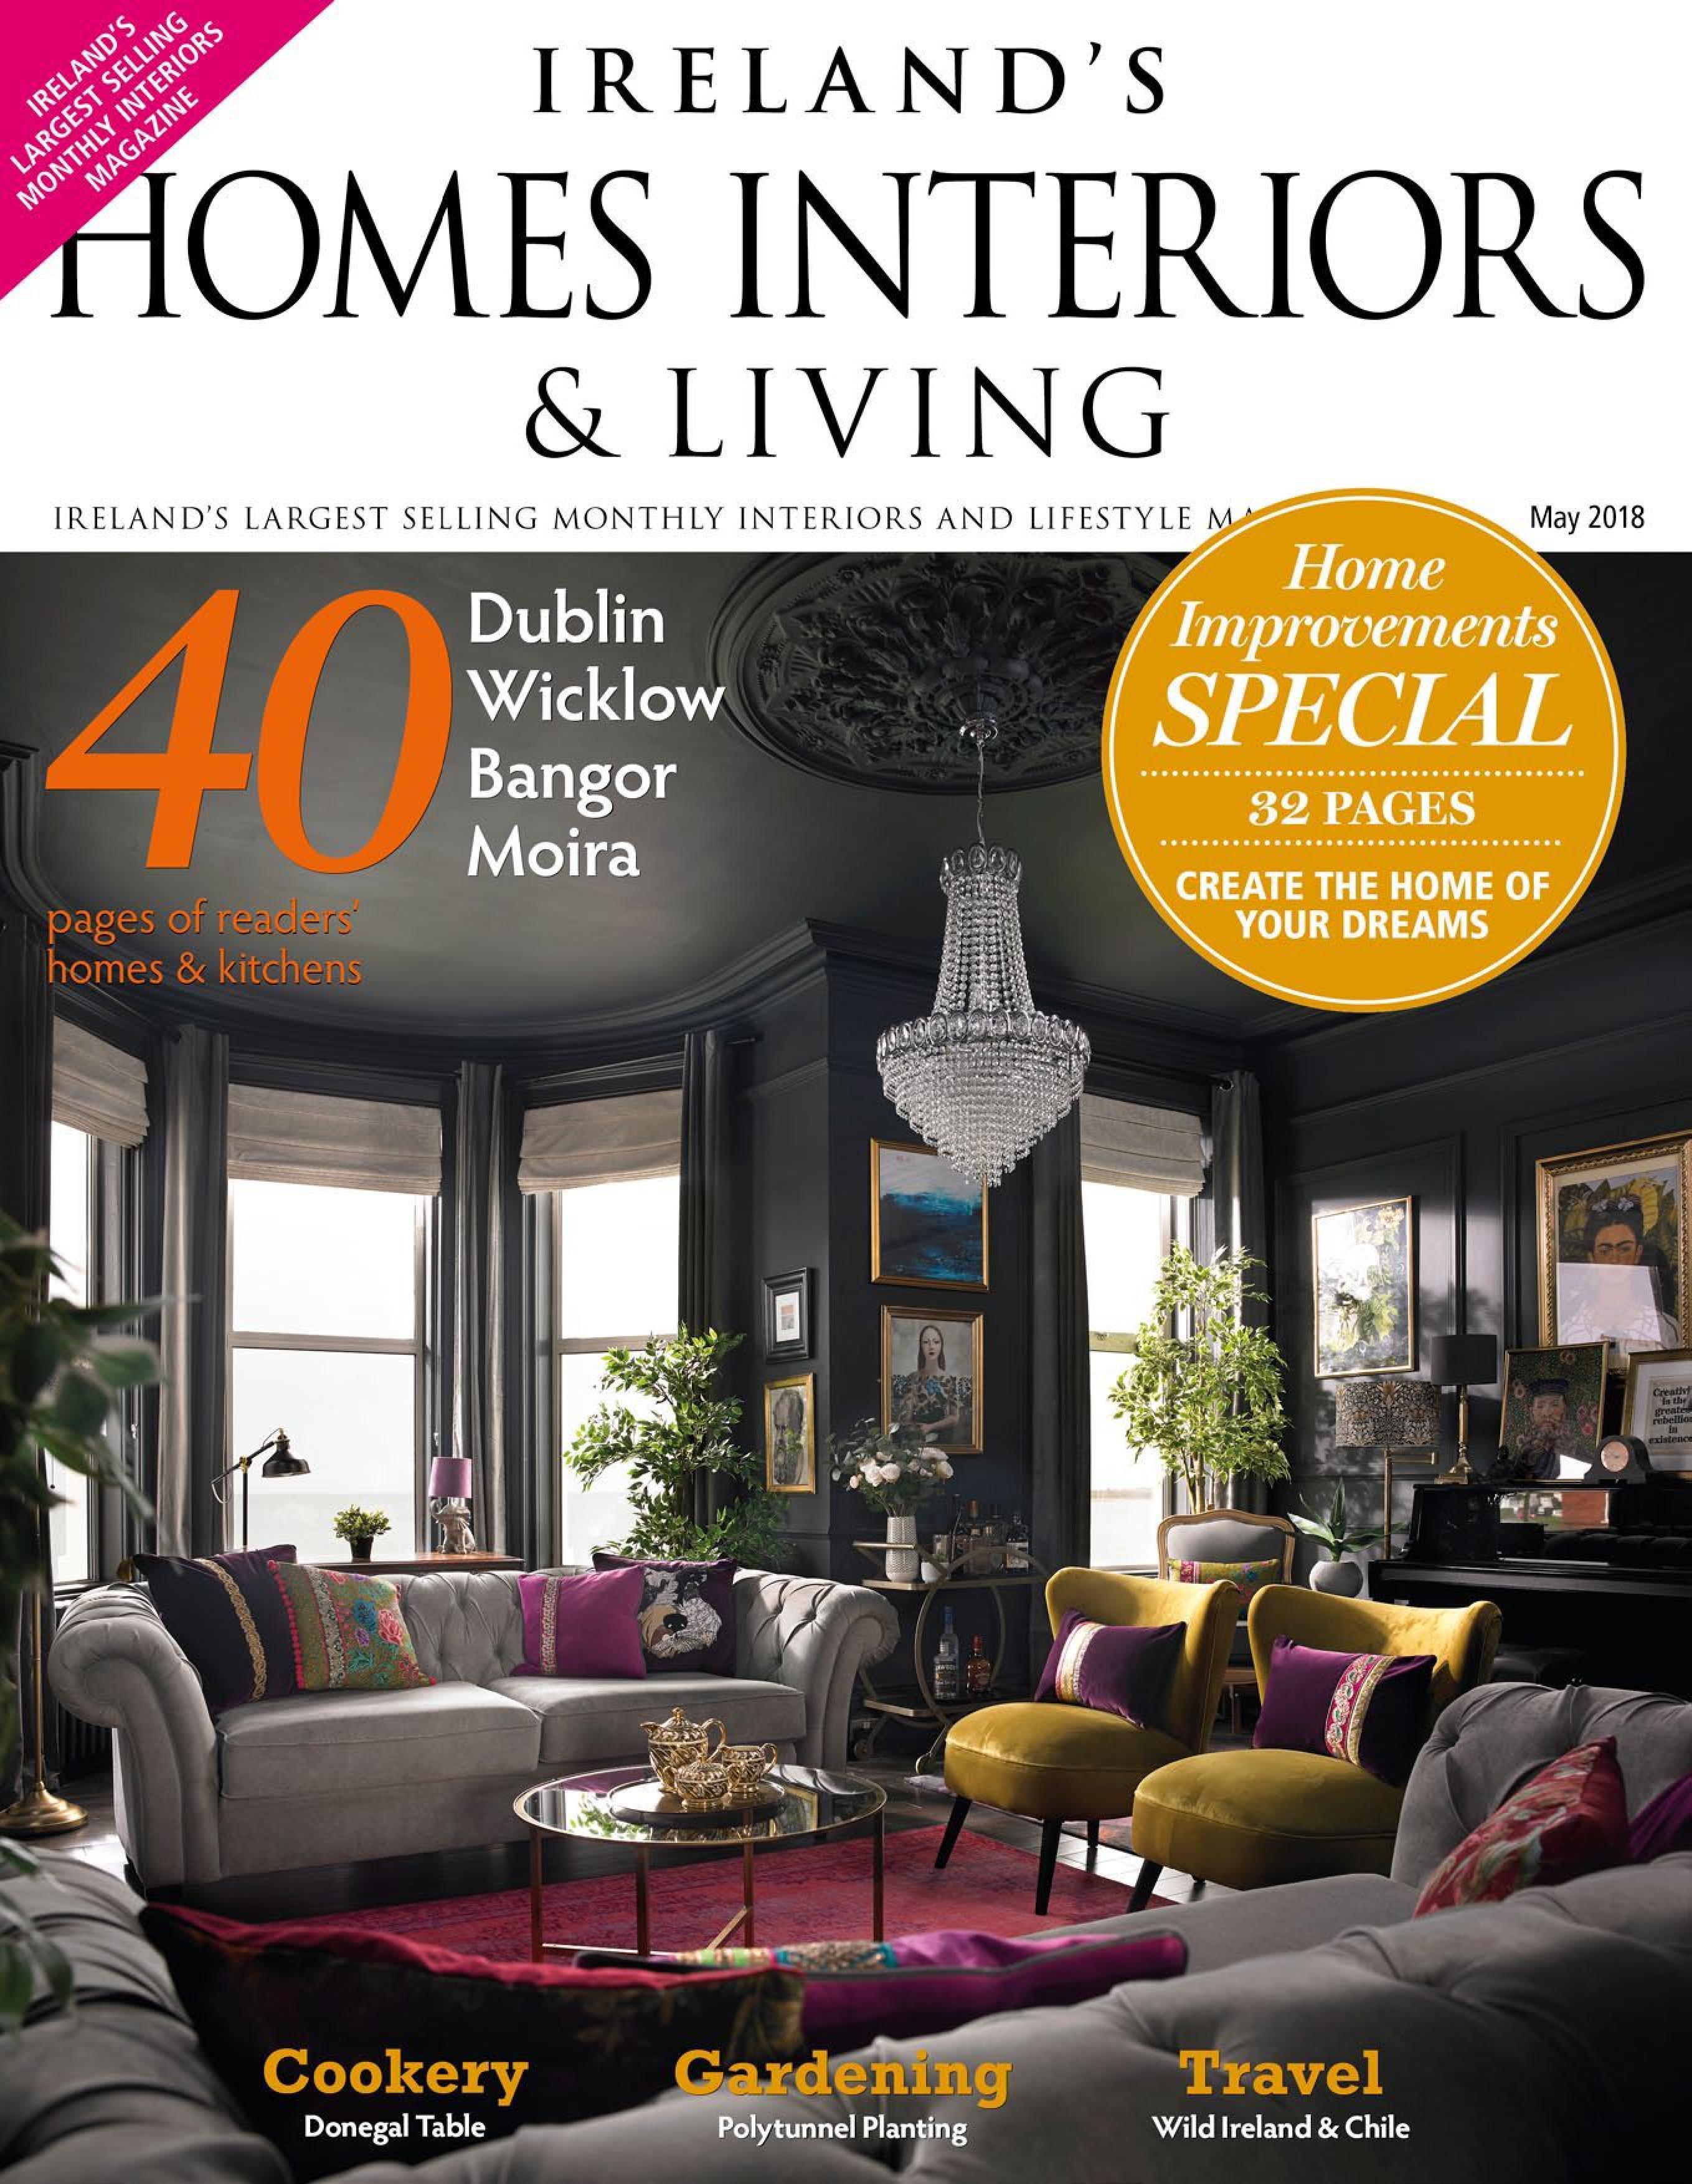 download ireland s homes interiors living may 2018 true pdf